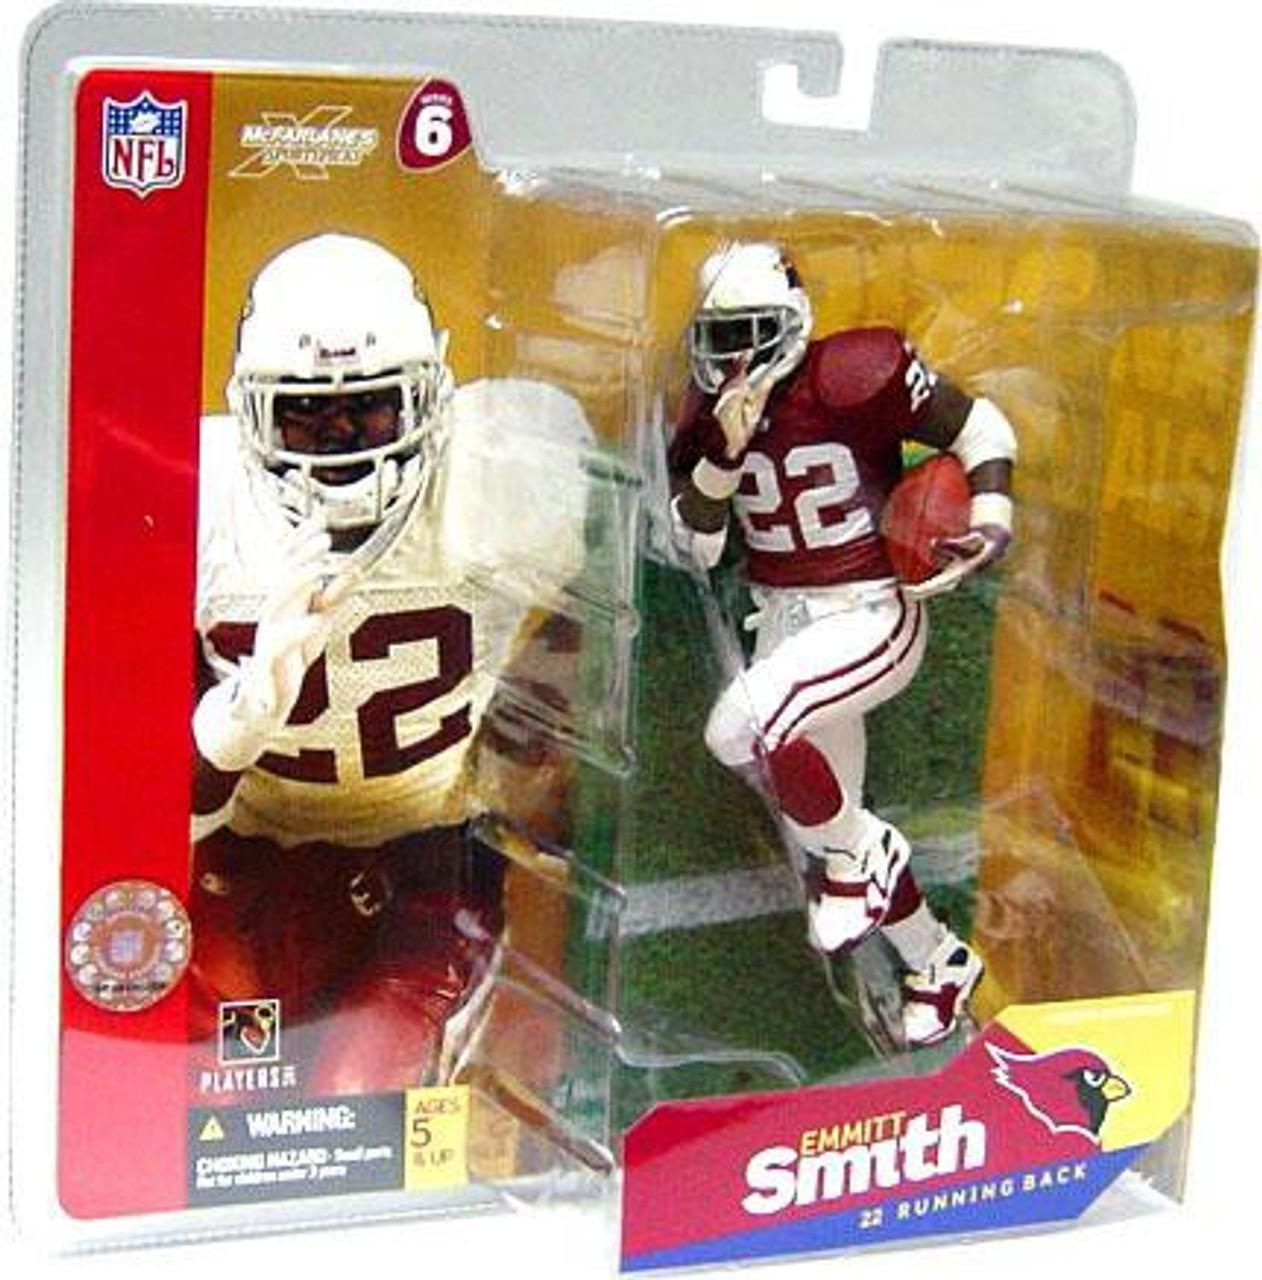 aa34ed041bd7 McFarlane Toys NFL Arizona Cardinals Sports Picks Series 6 Emmitt Smith  Action Figure  Red Jersey